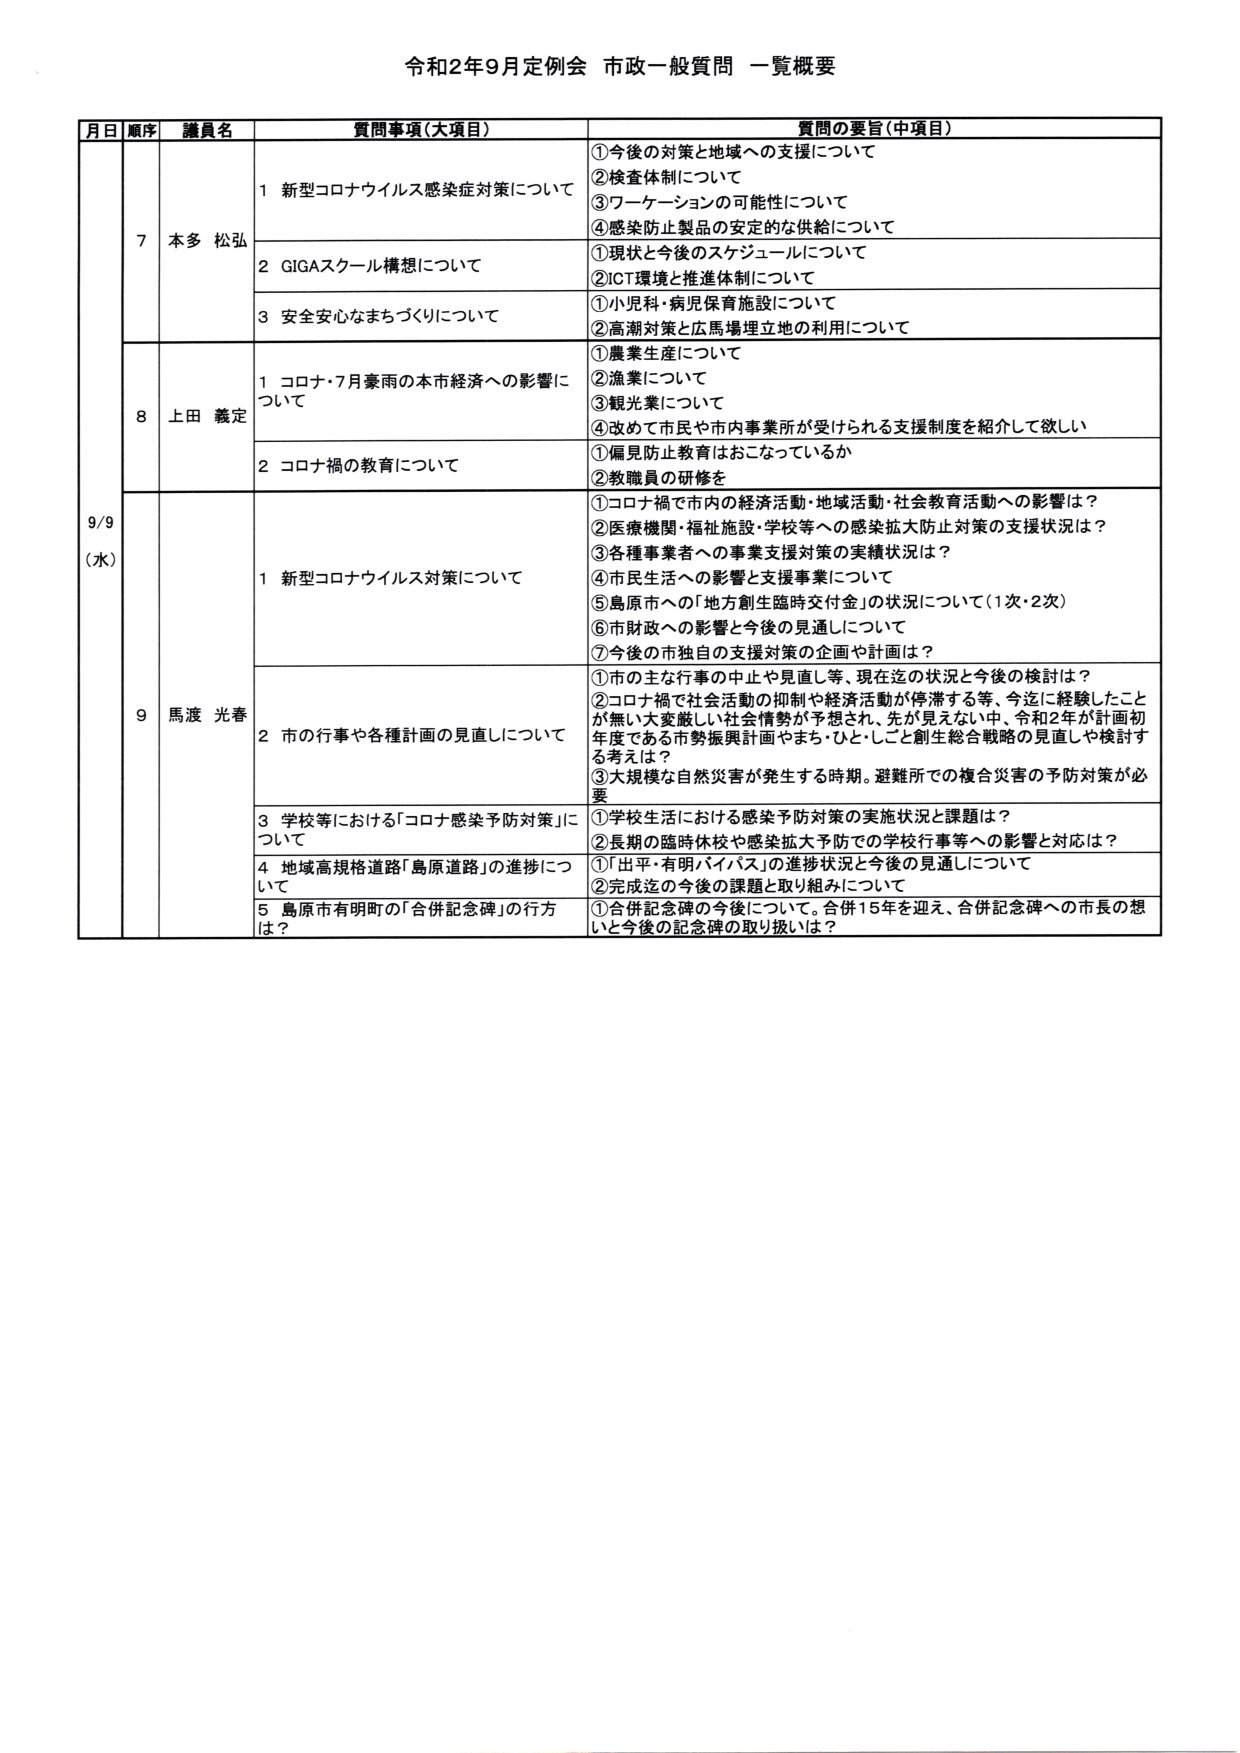 台風10号で議会日程変更_c0052876_11024179.jpg